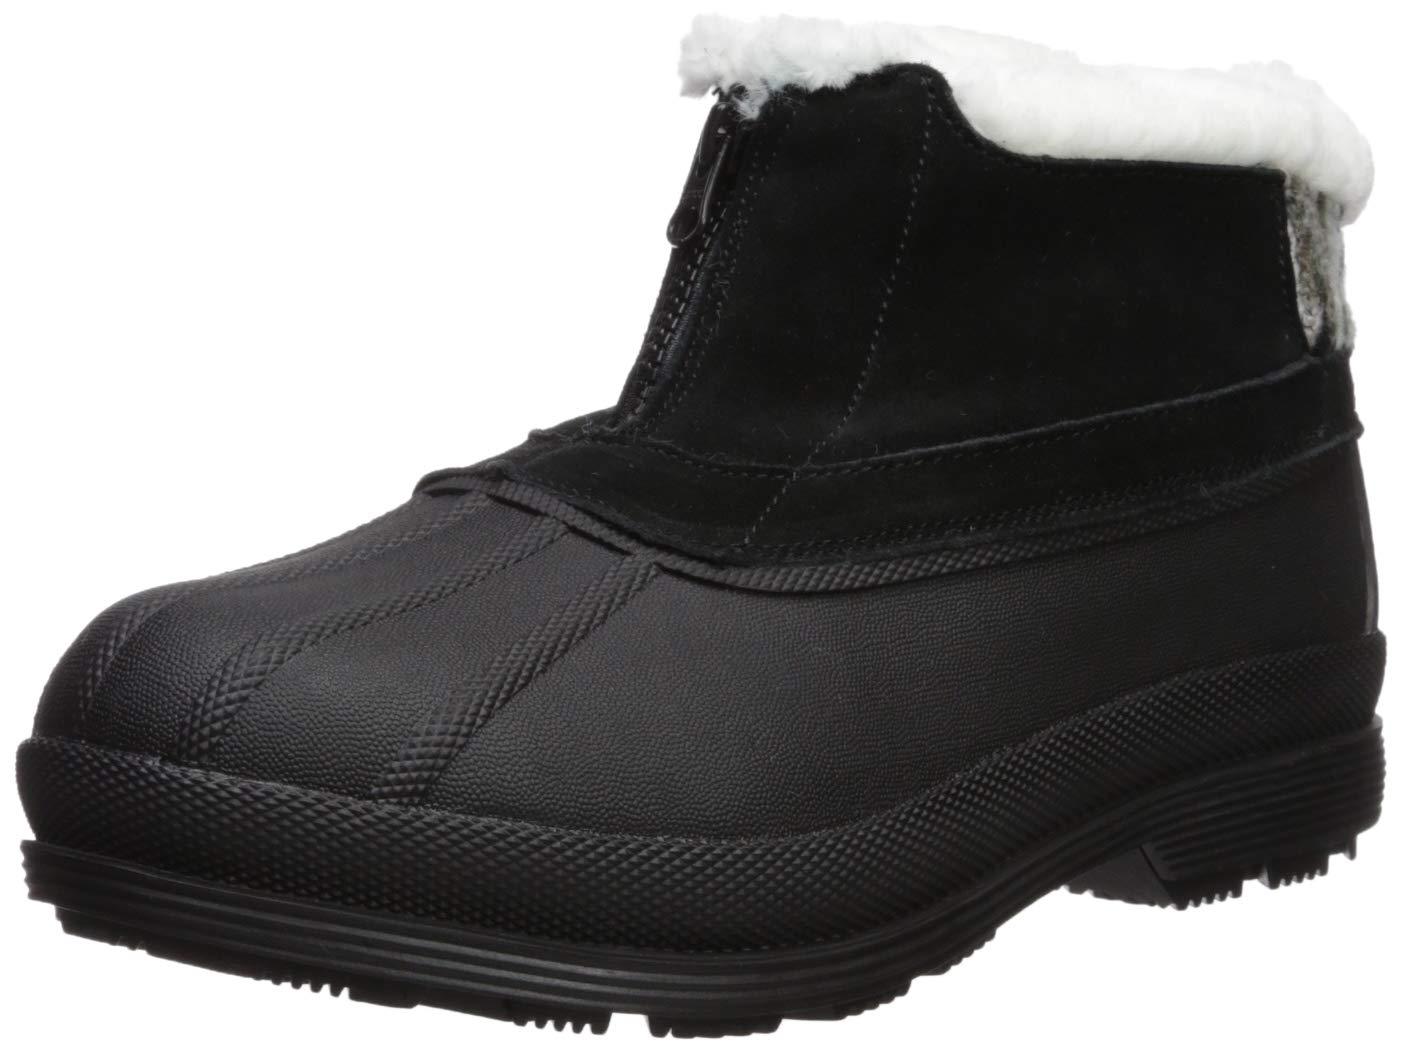 Propet Women's Lumi Ankle Zip Snow Boot, Black/White, 10 4E US